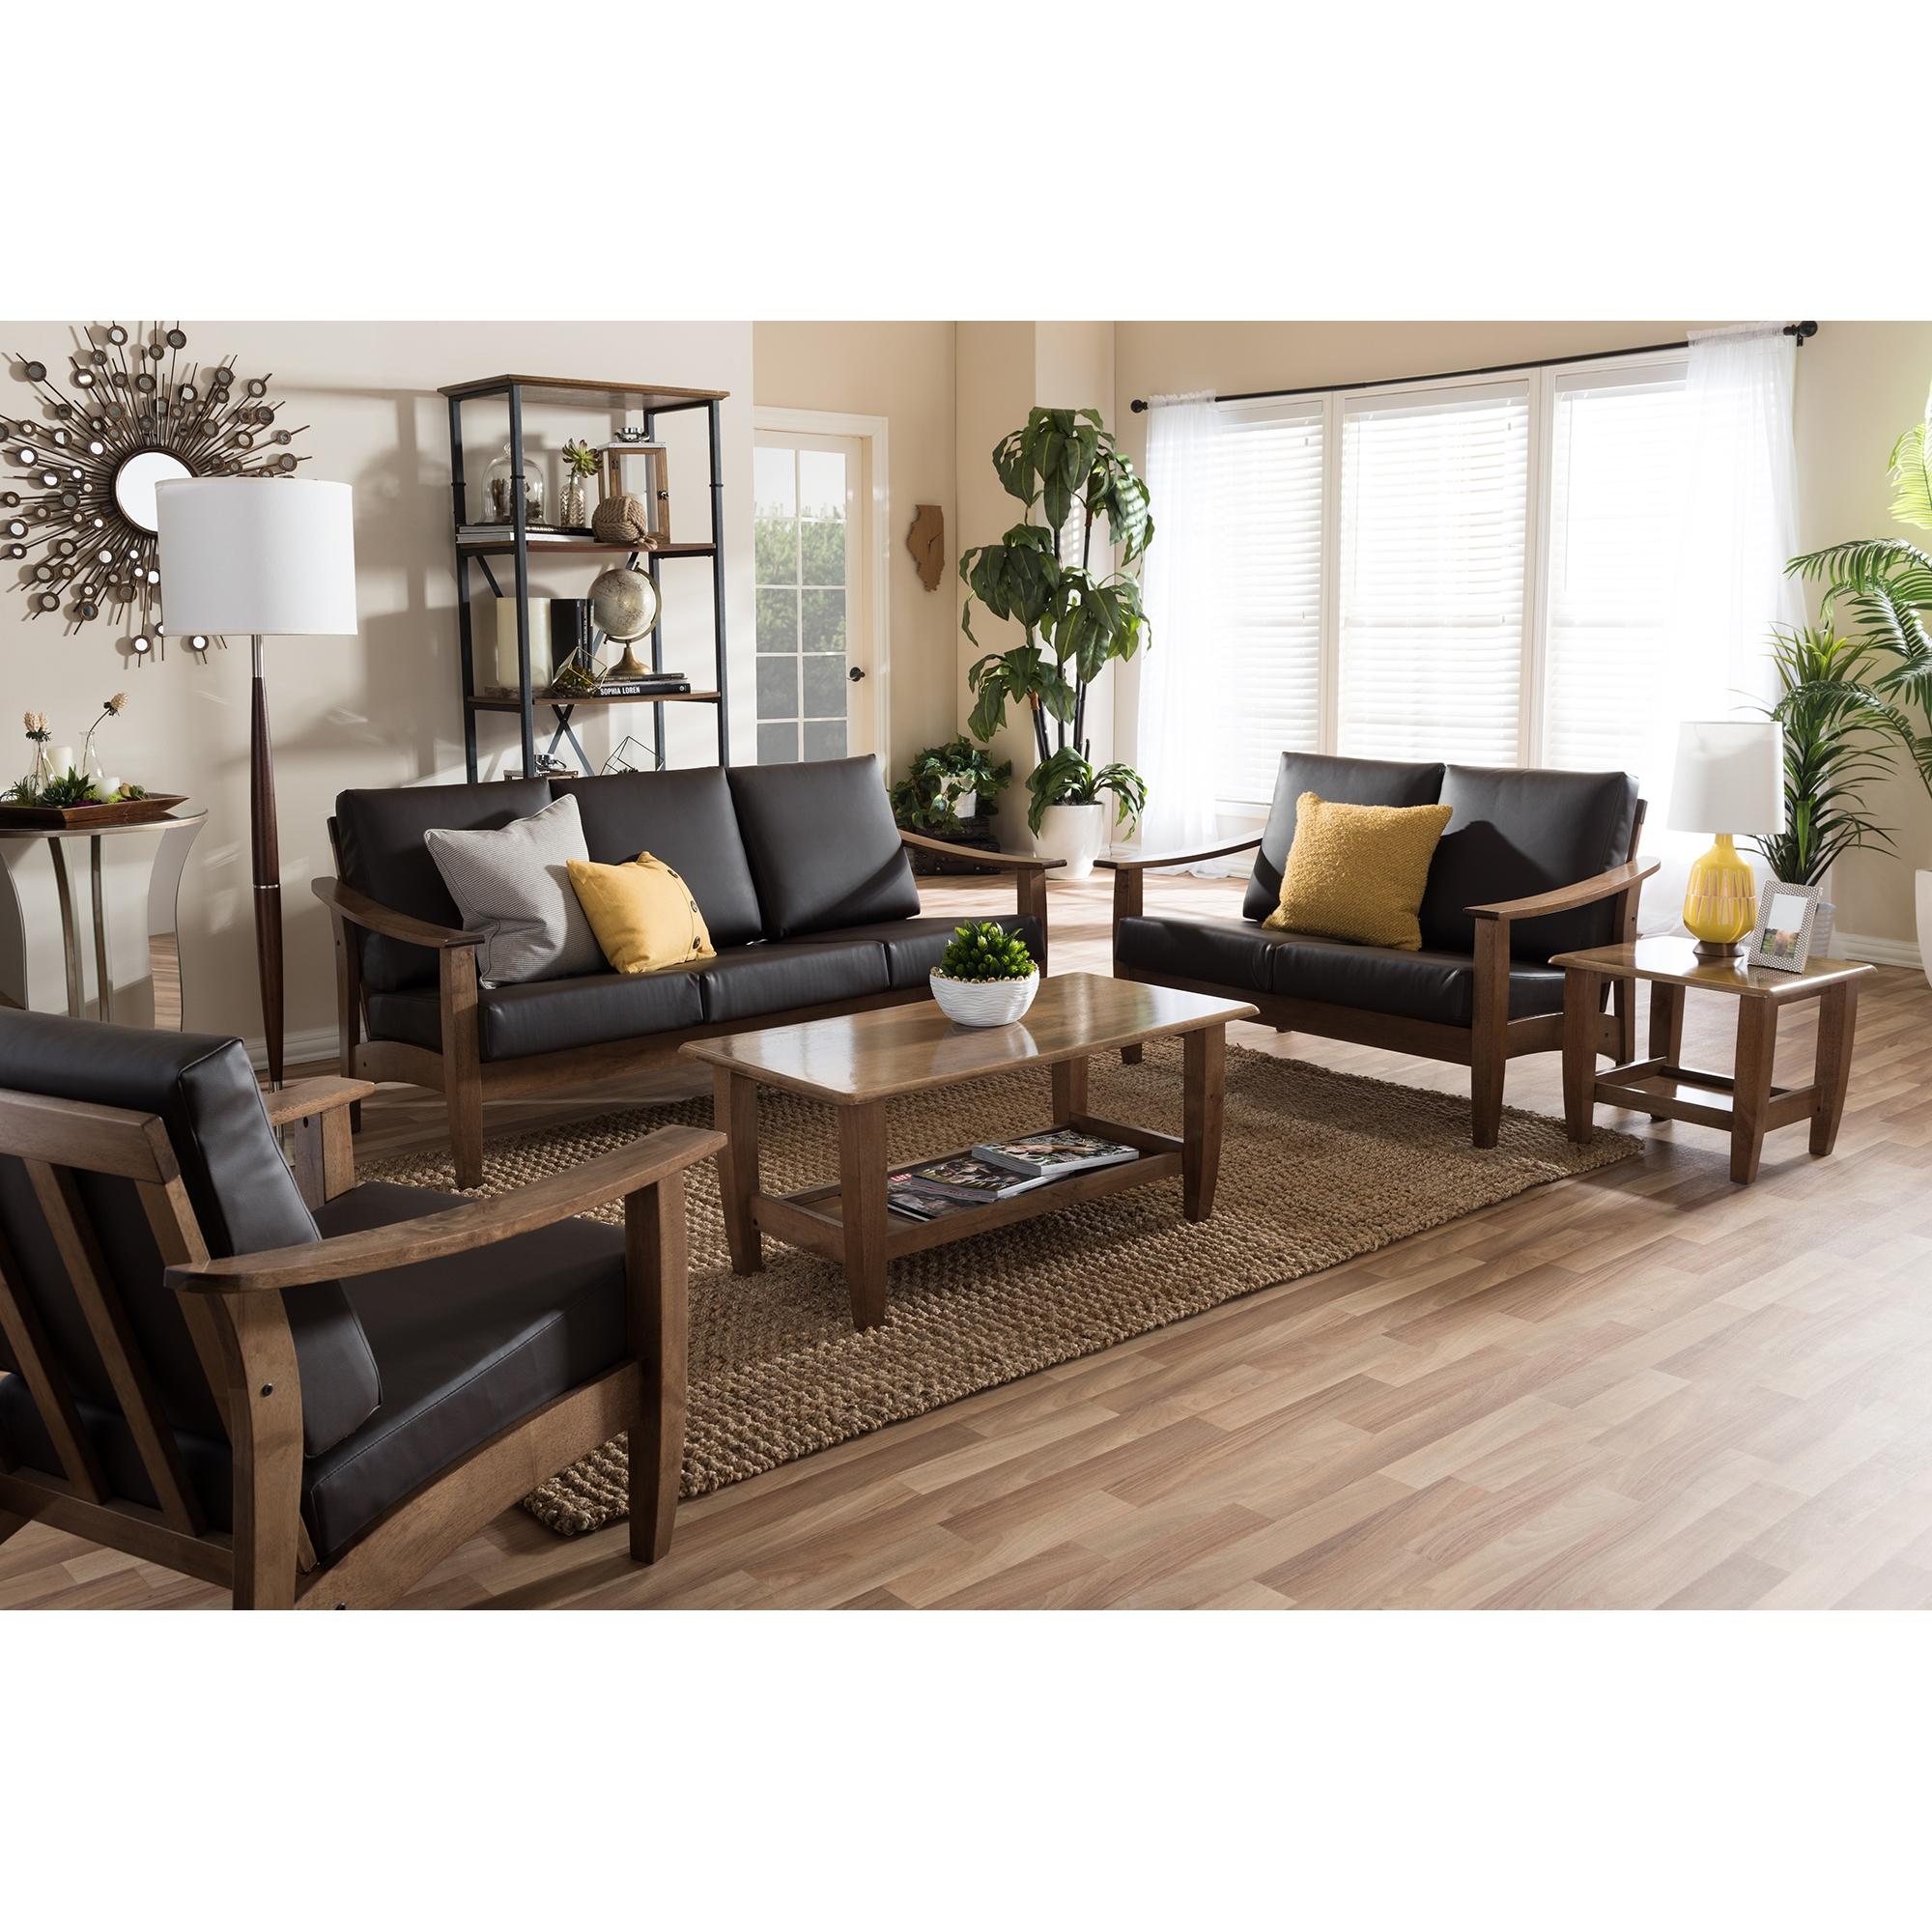 ... Baxton Studio Pierce Mid Century Modern Walnut Brown Wood And Dark  Brown Faux Leather Living